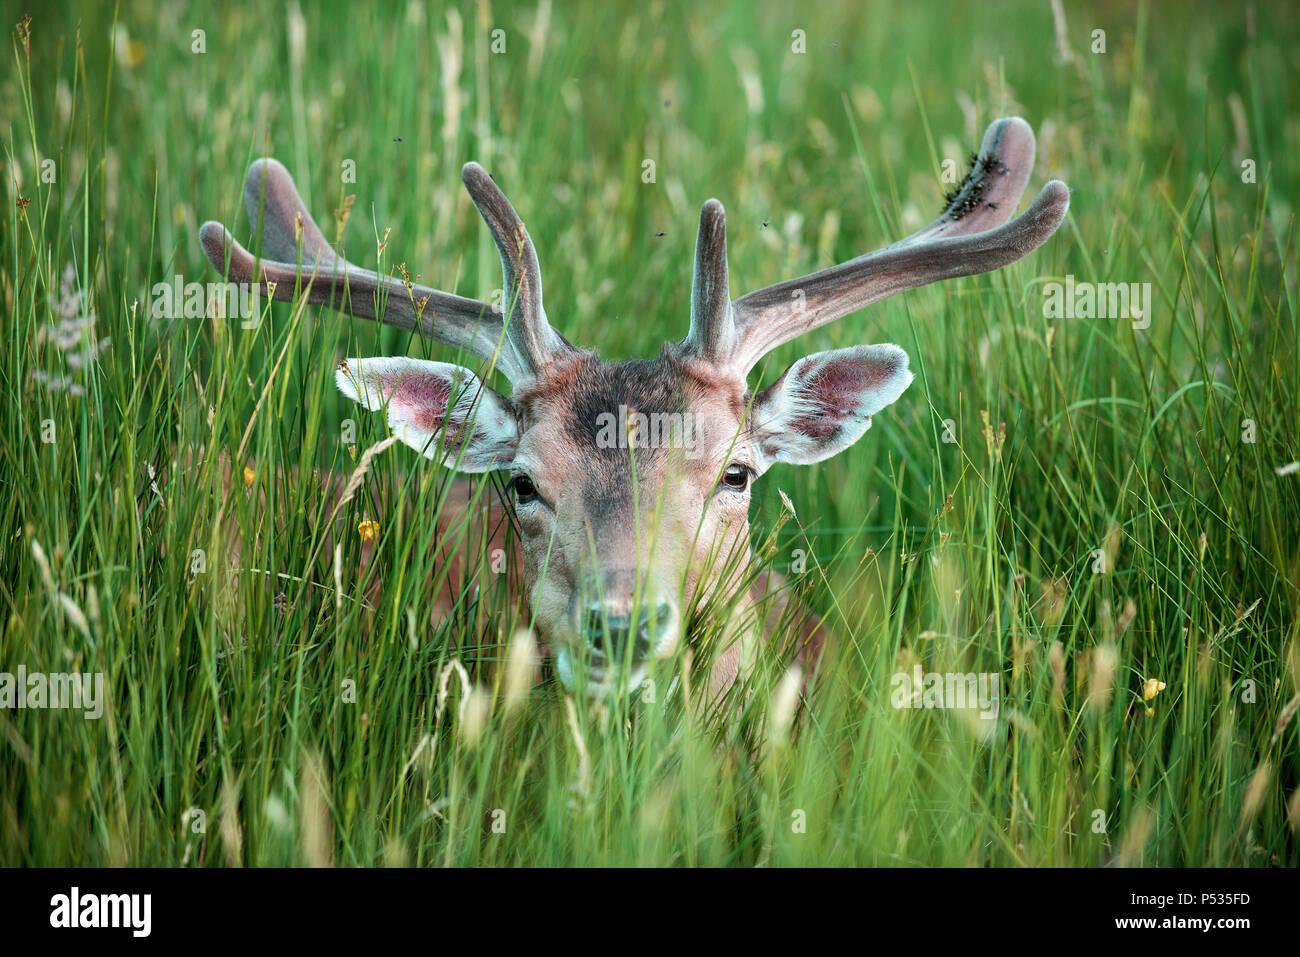 Fallow Deer Hiding in grass, UK (Dama Dama) - Stock Image